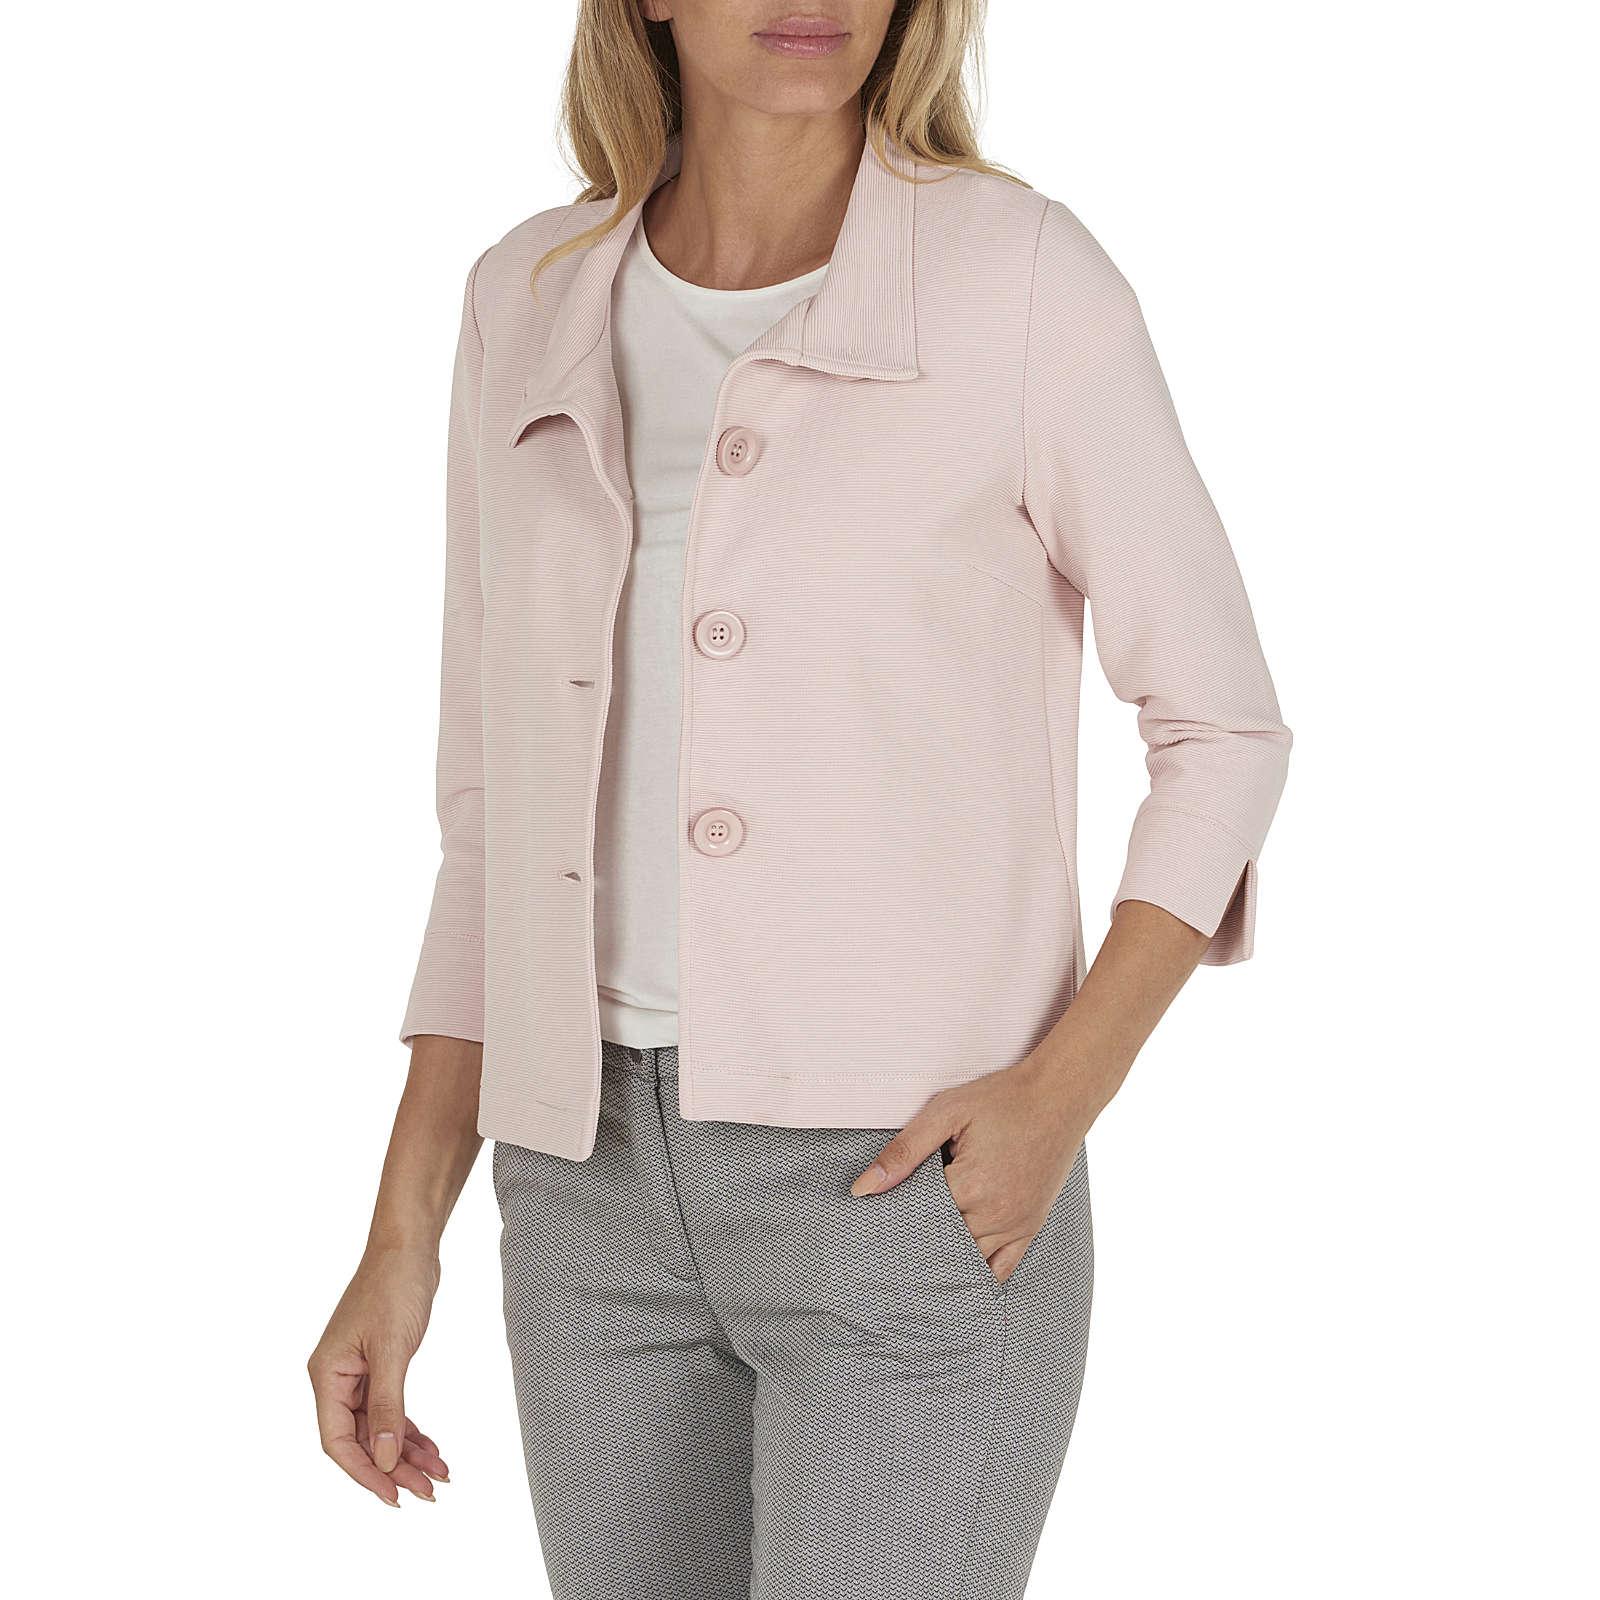 Betty Barclay Shirtjacke Sweatblazer rosa Damen Gr. 40